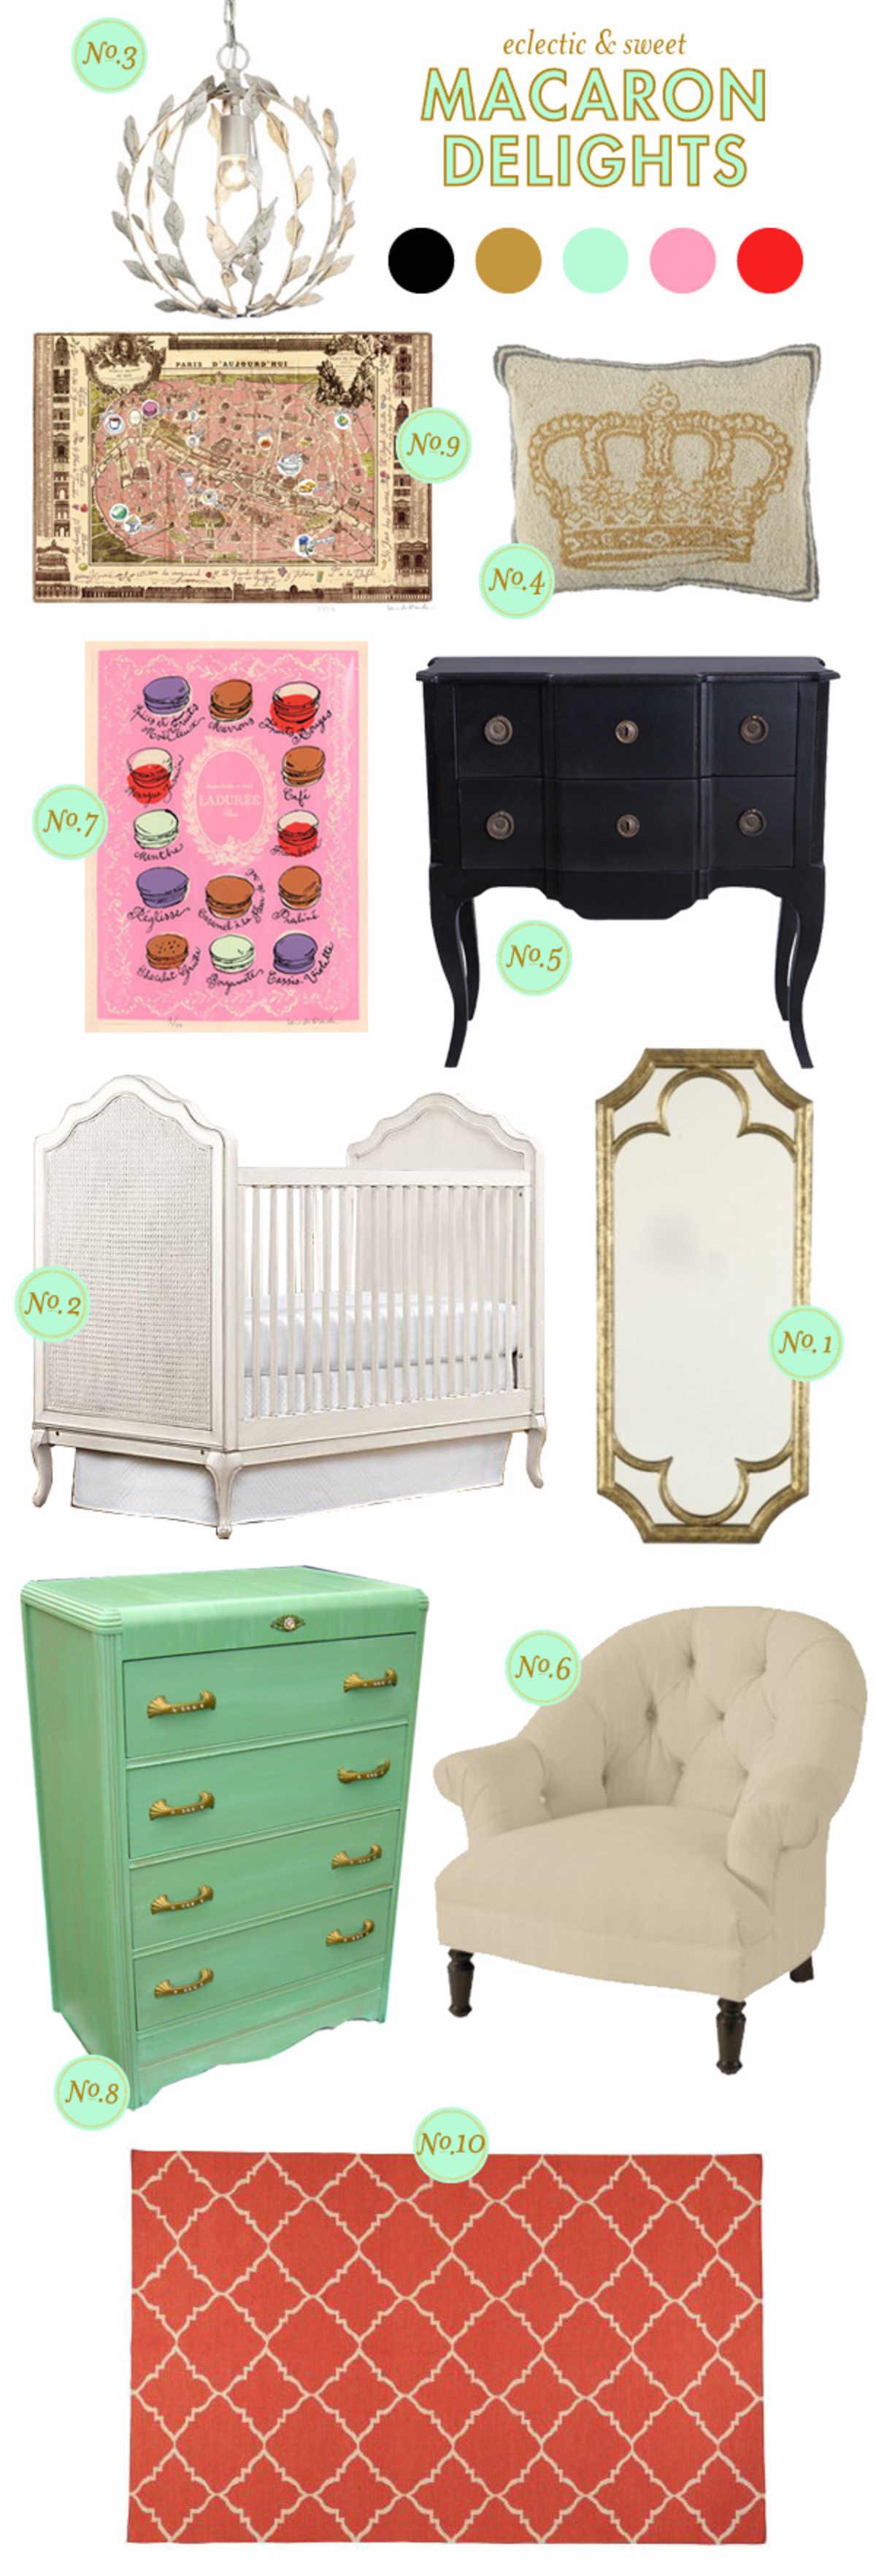 girl nursery inspiration board